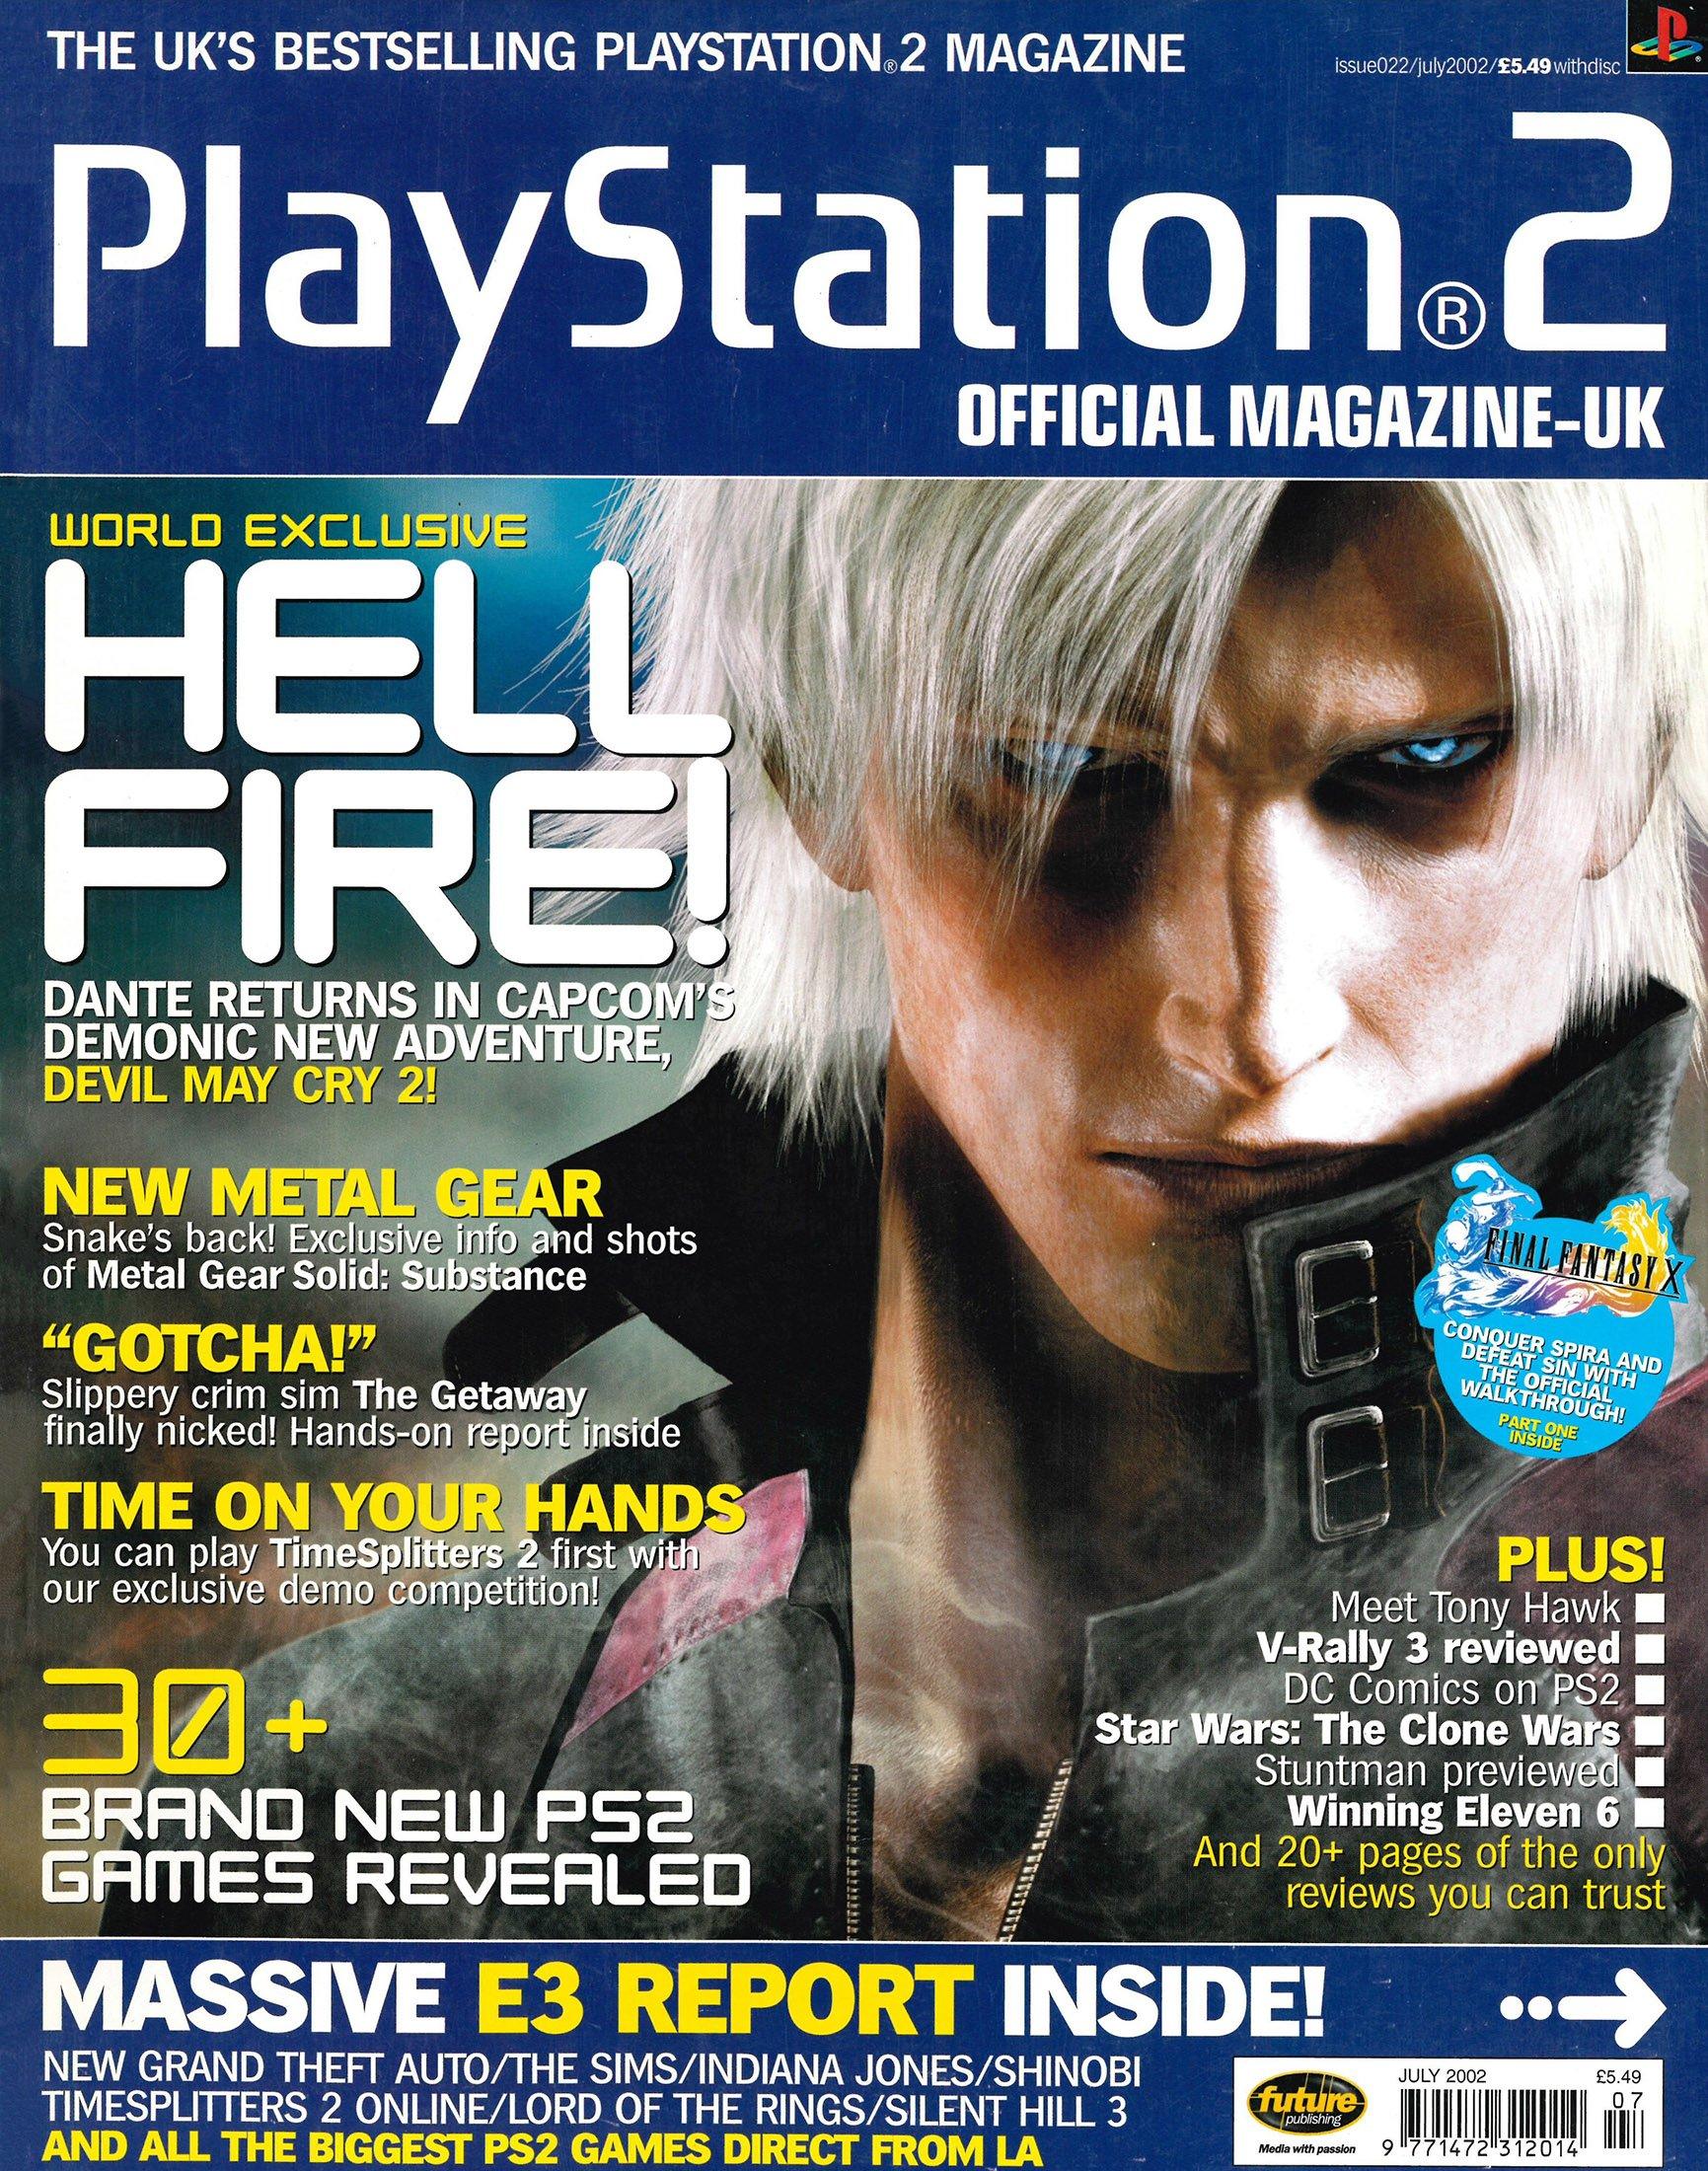 Official Playstation 2 Magazine UK 022 (July 2002)